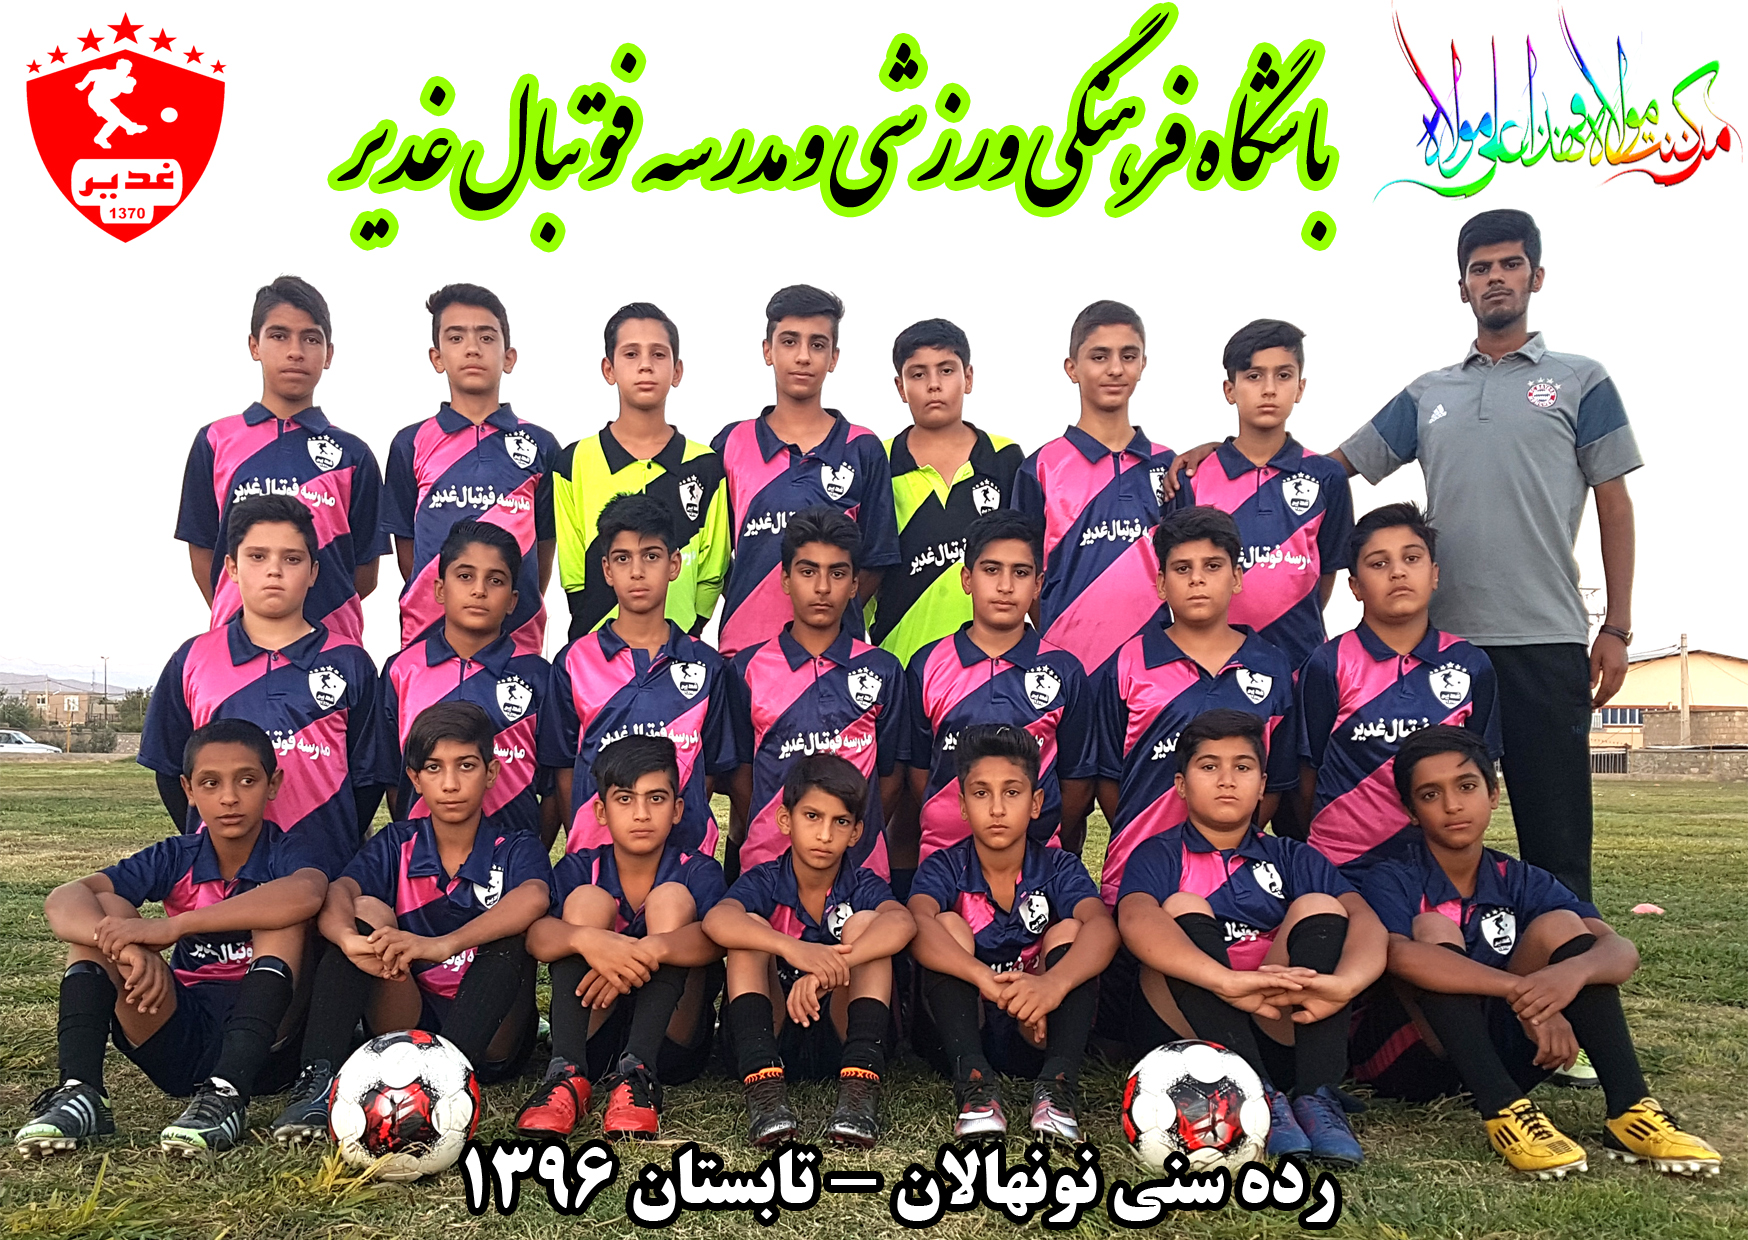 مدرسه فوتبال غدیر فسا